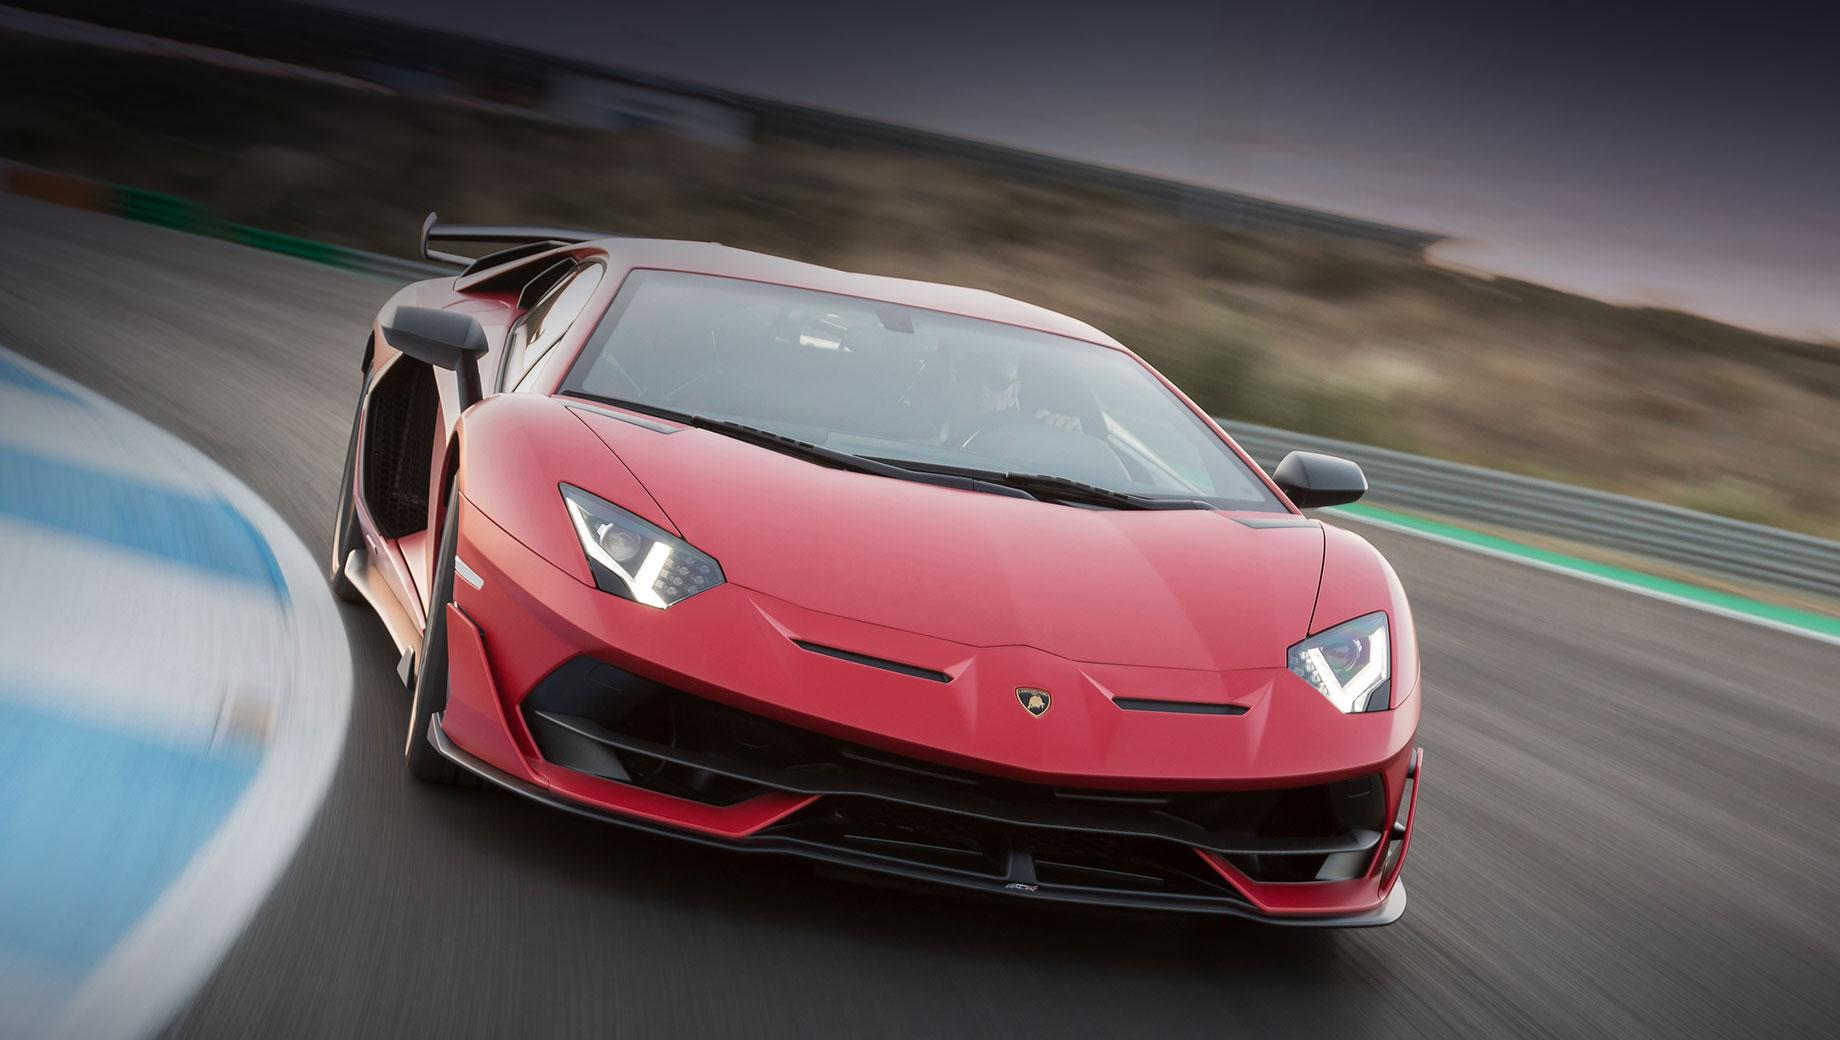 Фирма Lamborghini предпочтёт скорости управляемость